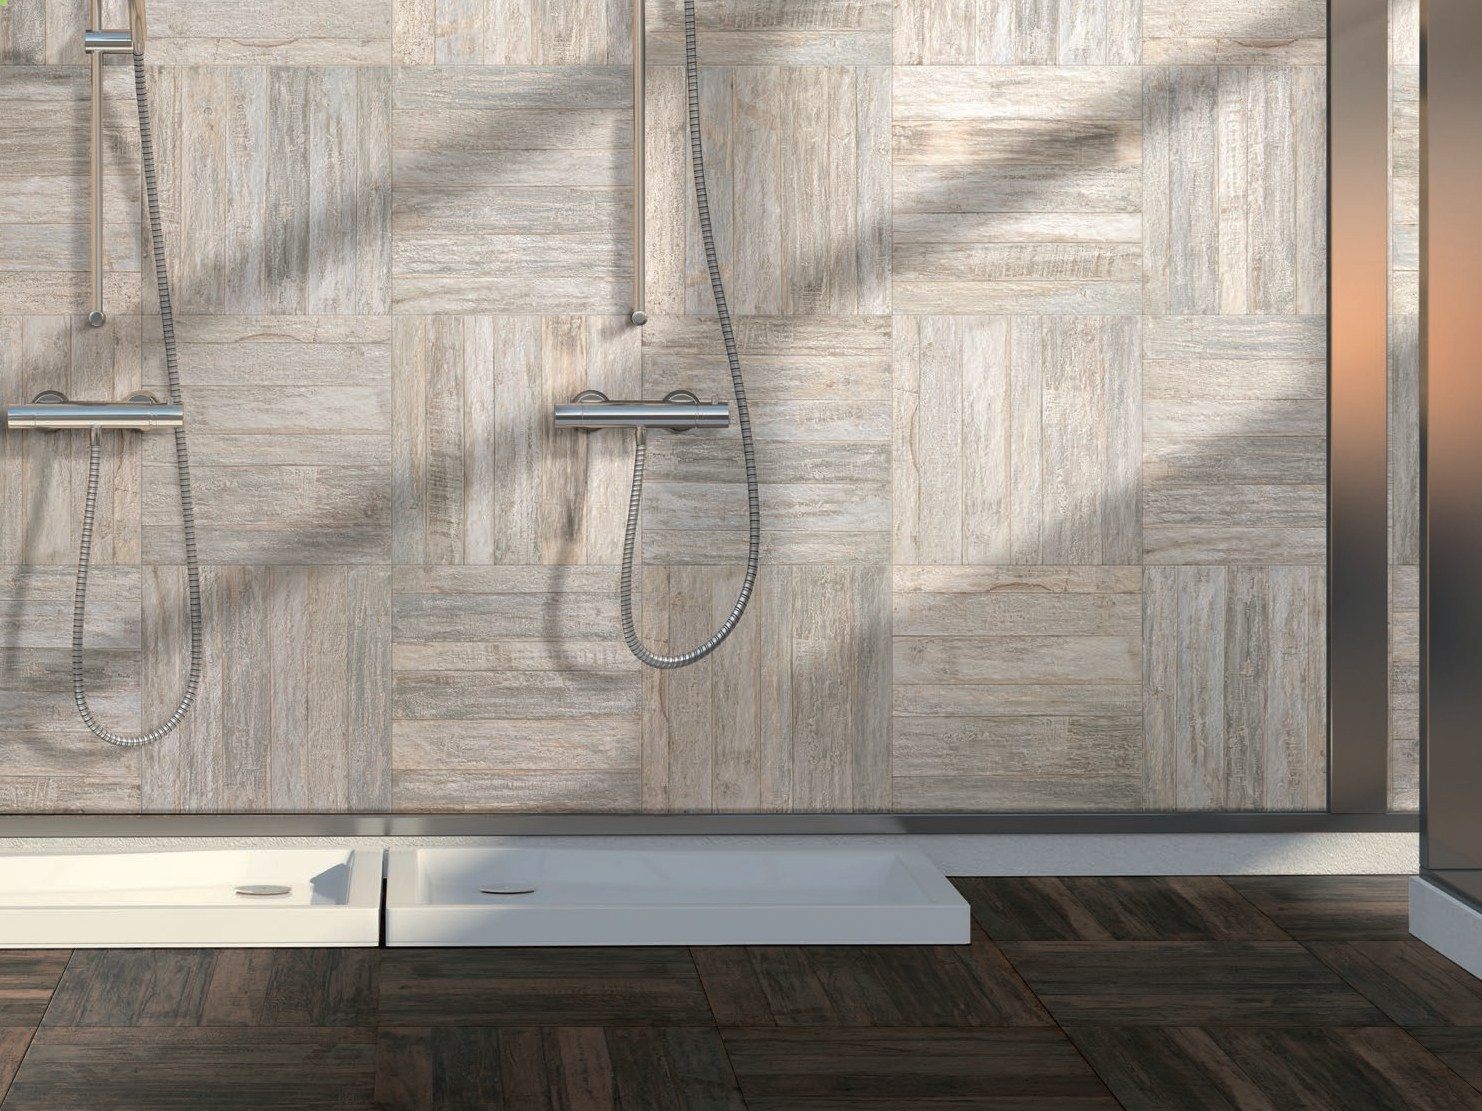 Saint tropez rivestimento per esterni by cir - Revestimientos para duchas ...